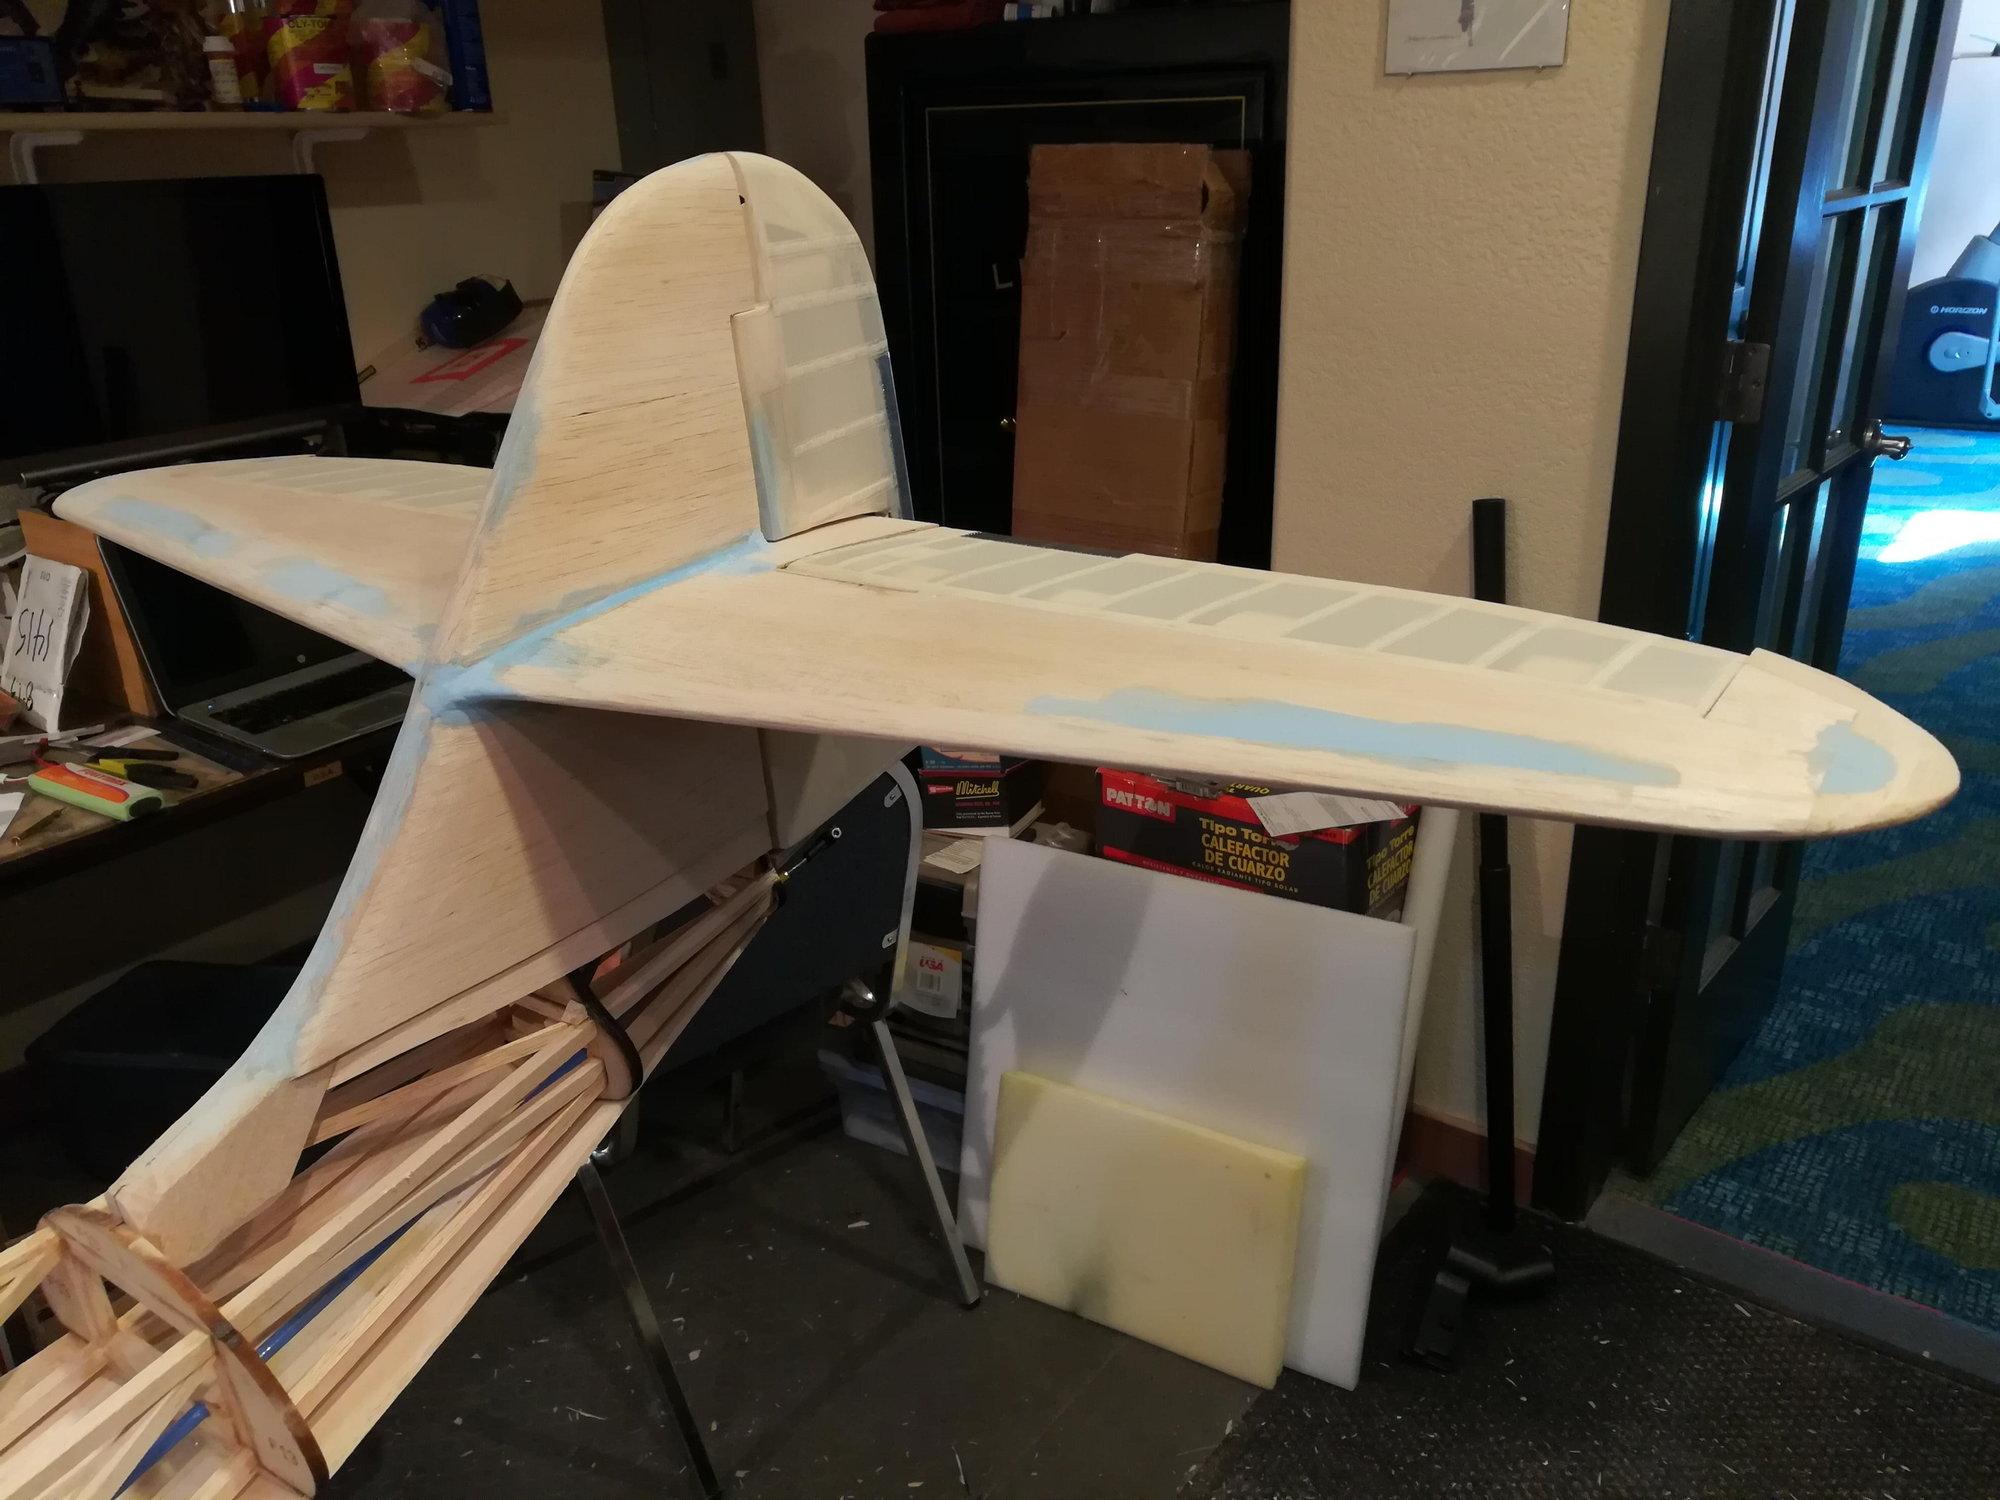 PBY Catalina (Vintage Plans) Build Thread - RCU Forums